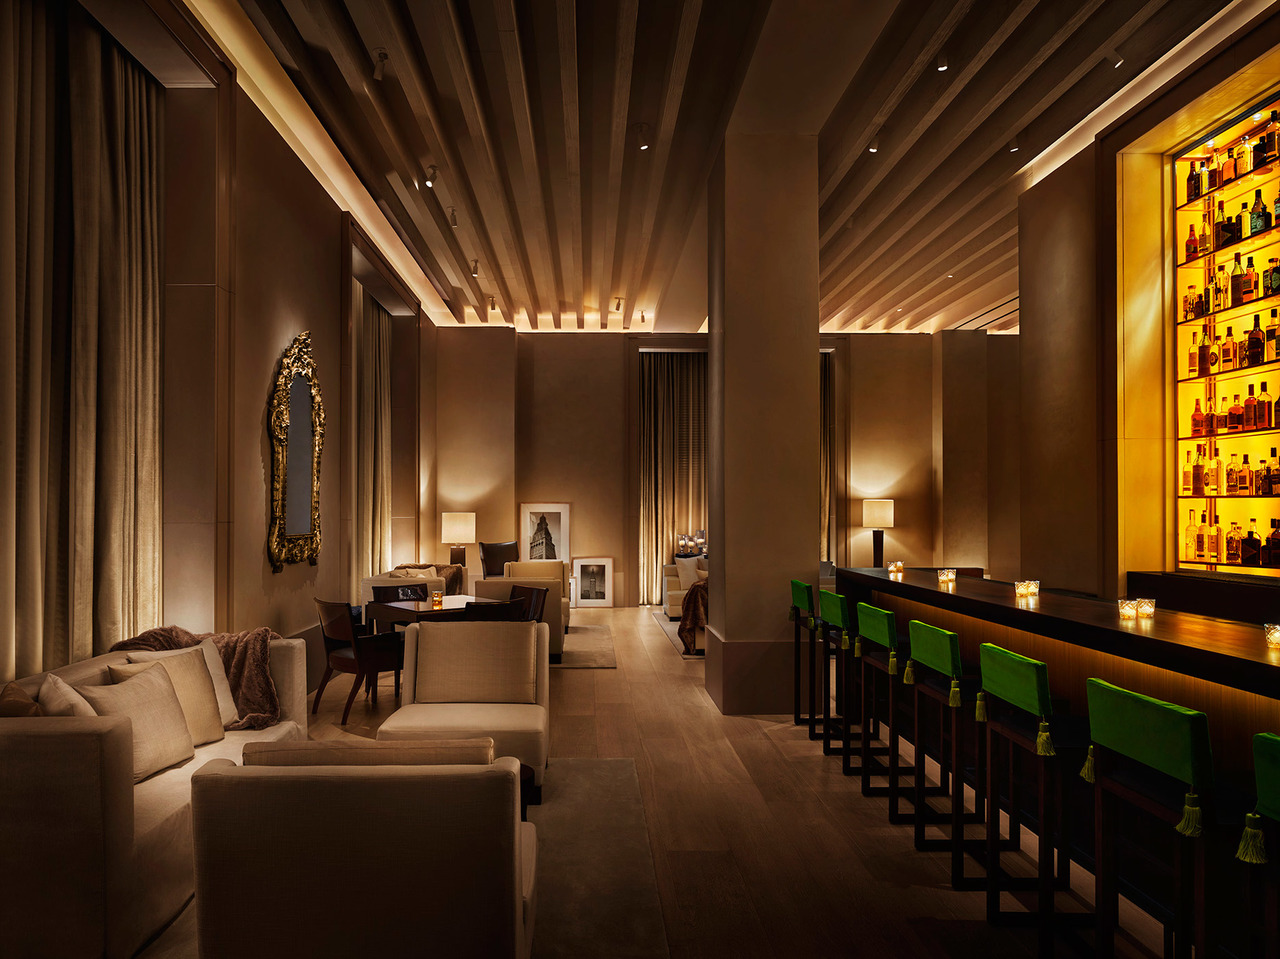 Lobby-Bar-Full-1870x1400.jpg